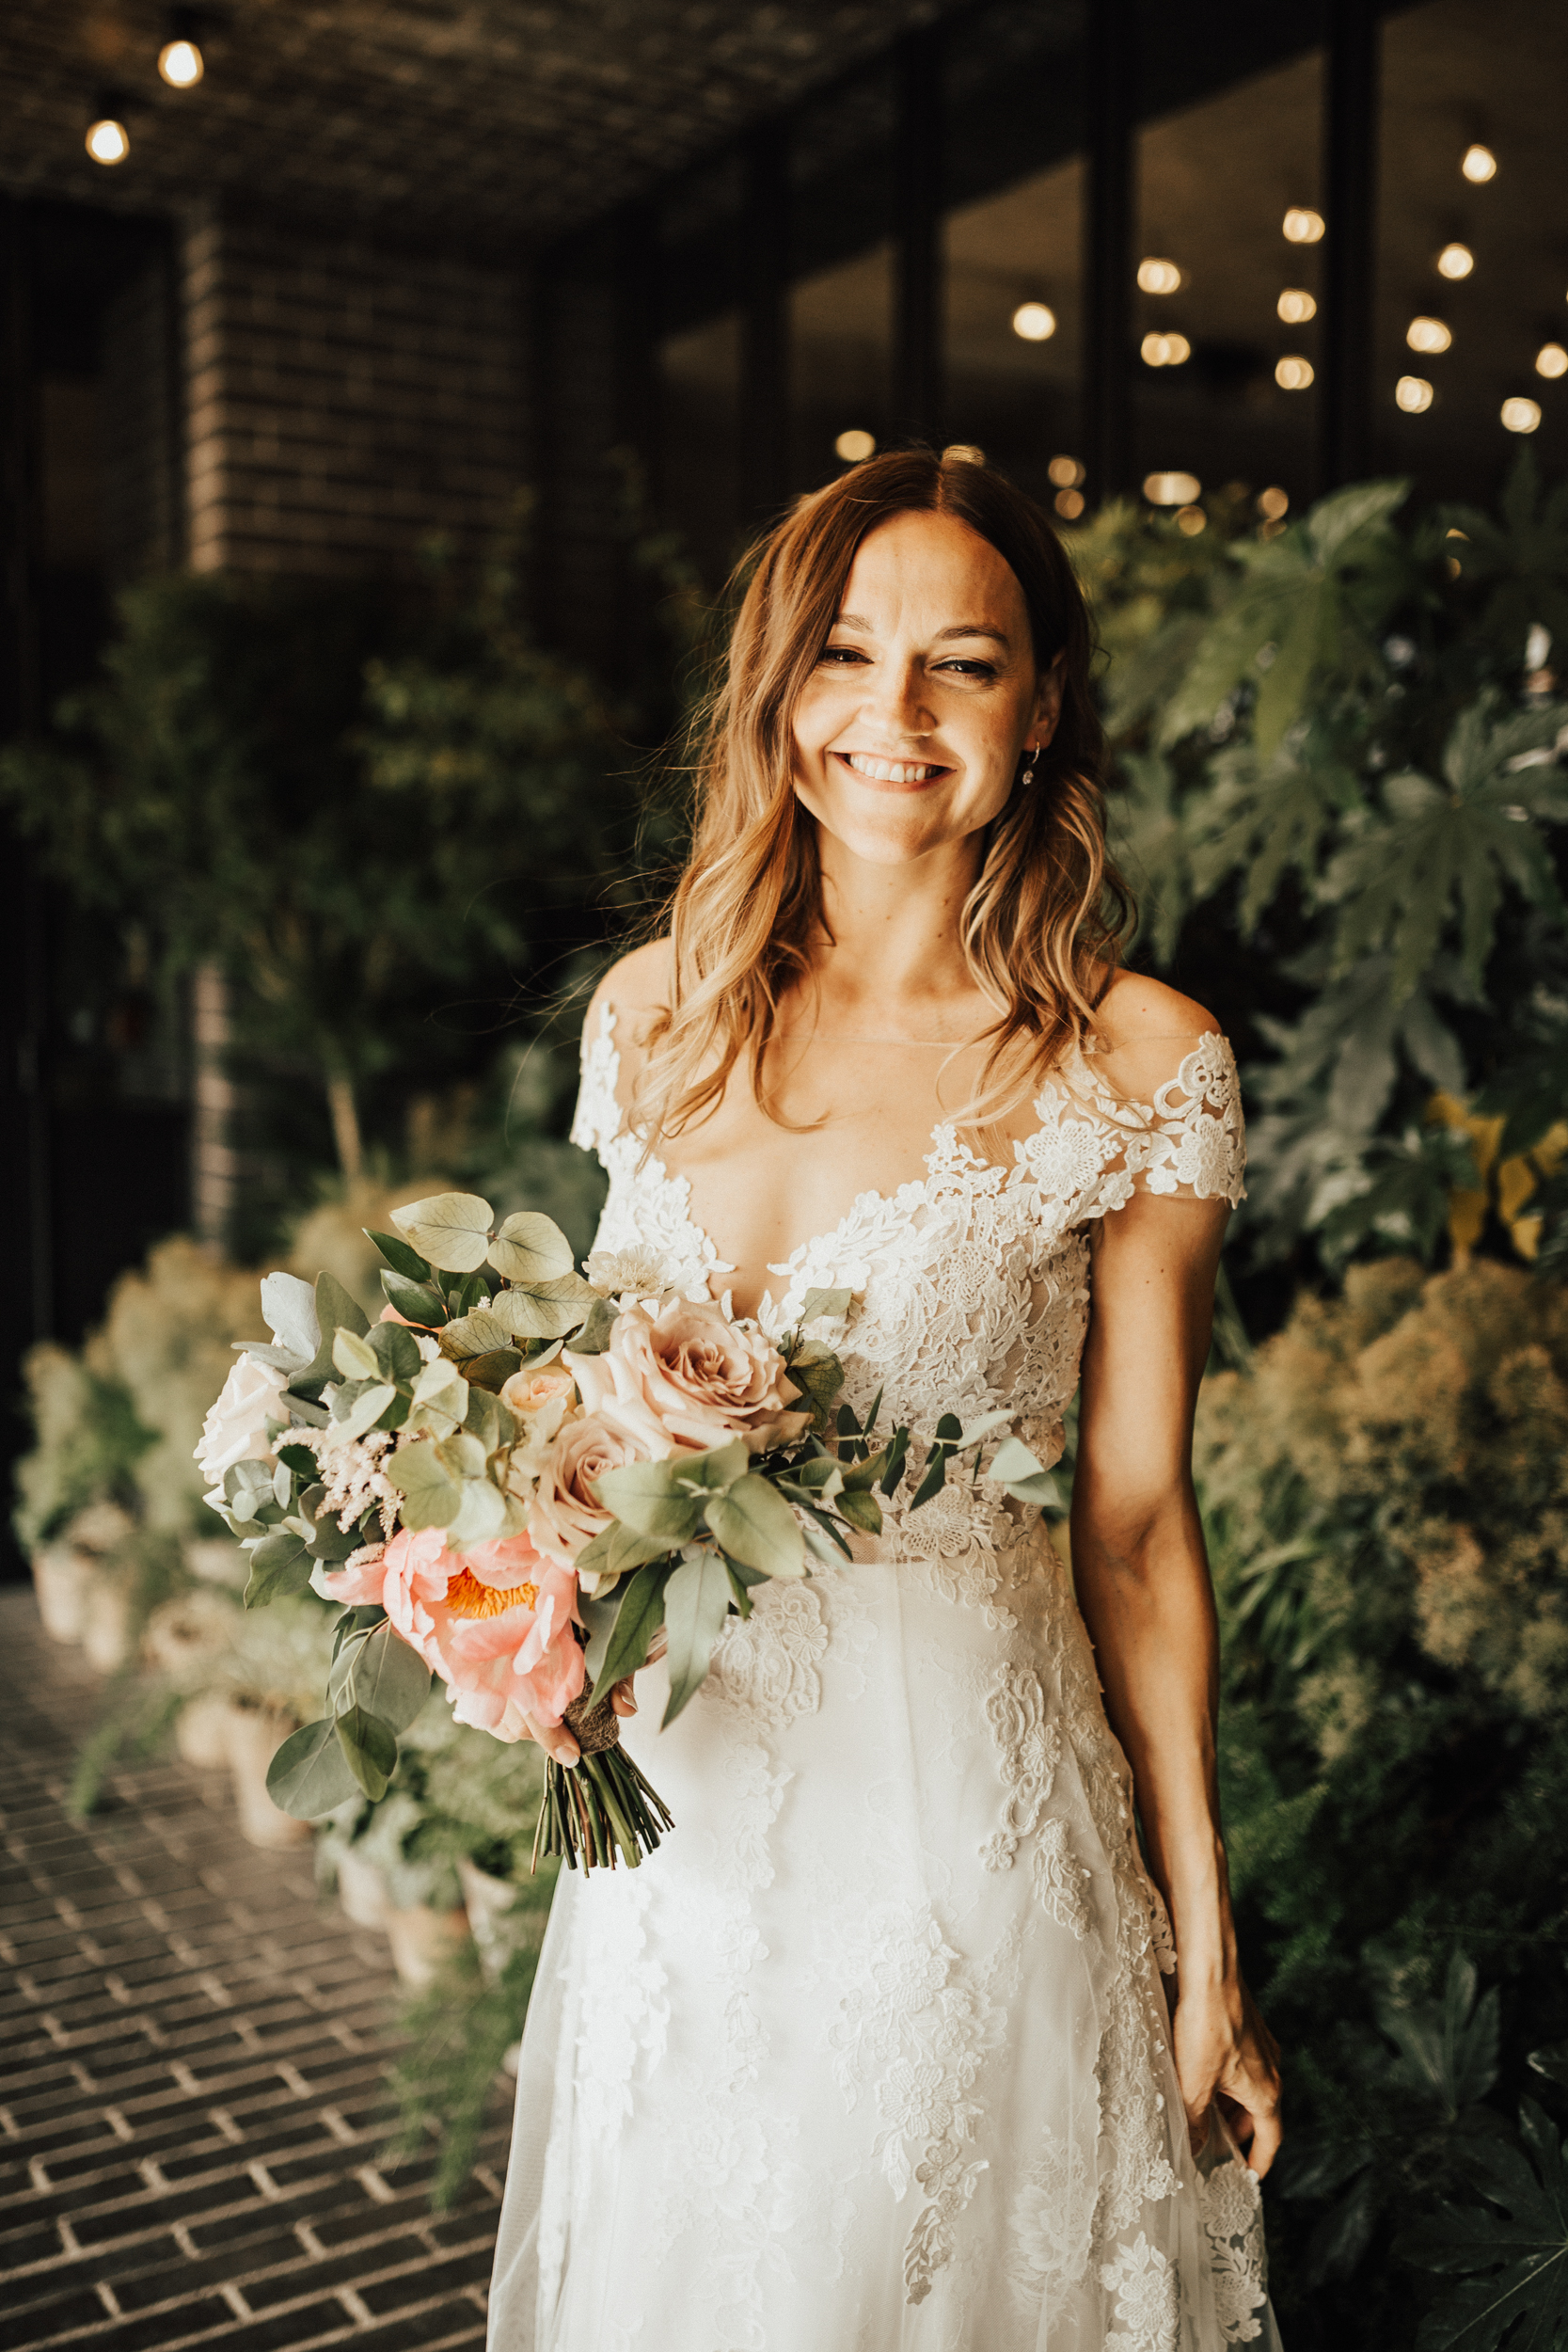 Laura-Benn-The-Asylum-London-The-Ace-Hotel-Wedding-Alternative-Darina-Stoda-Photography-112.jpg